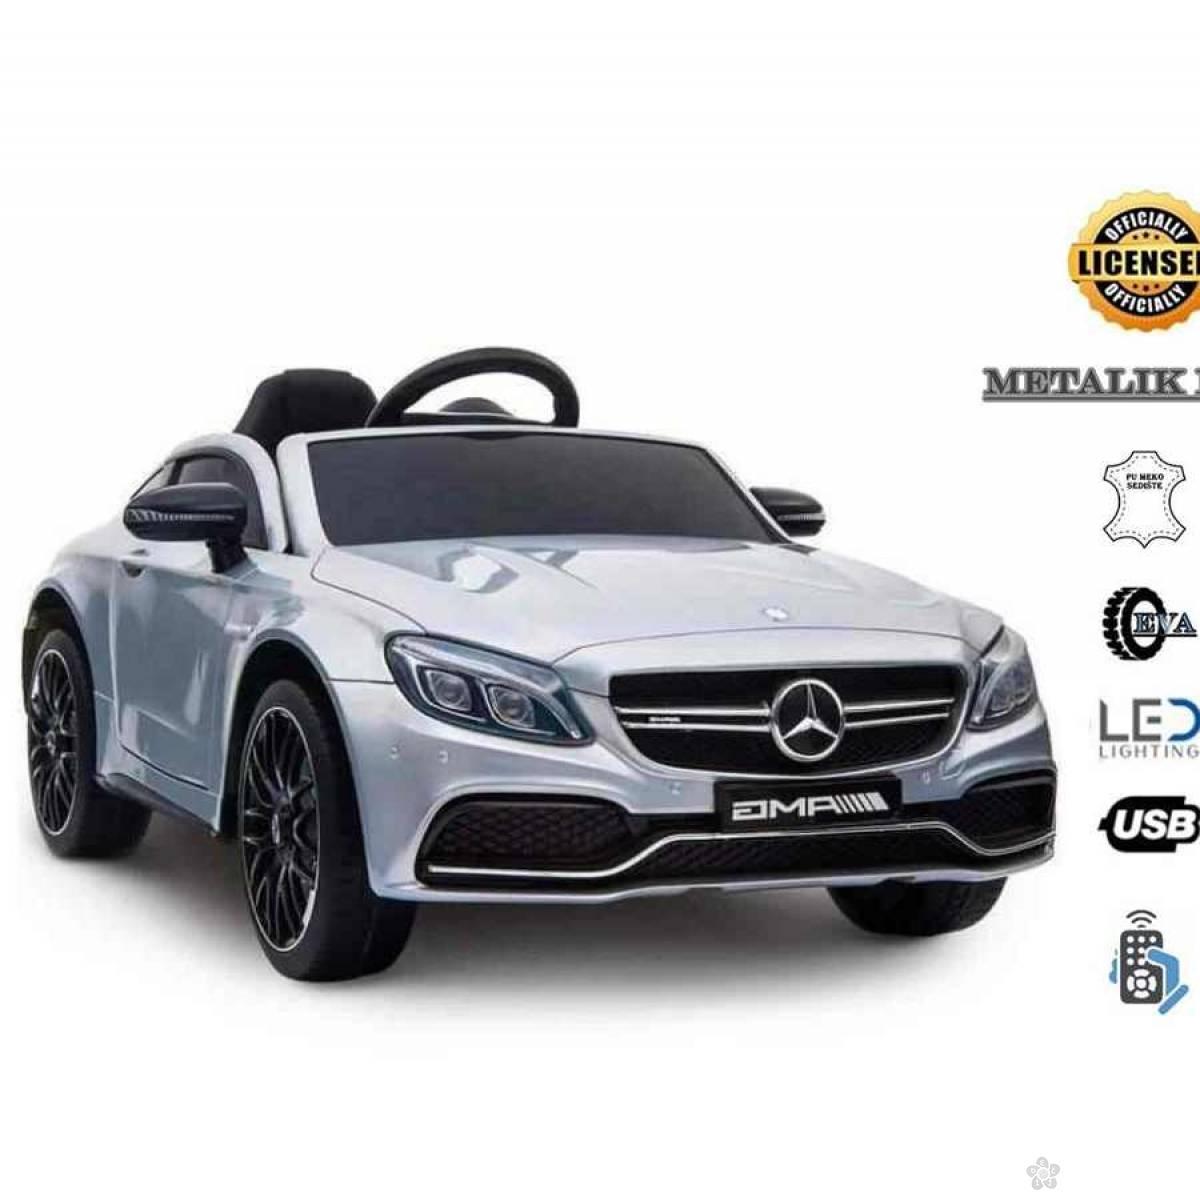 Dečiji Mercedes na akumulator model 246-1, metalik sivi